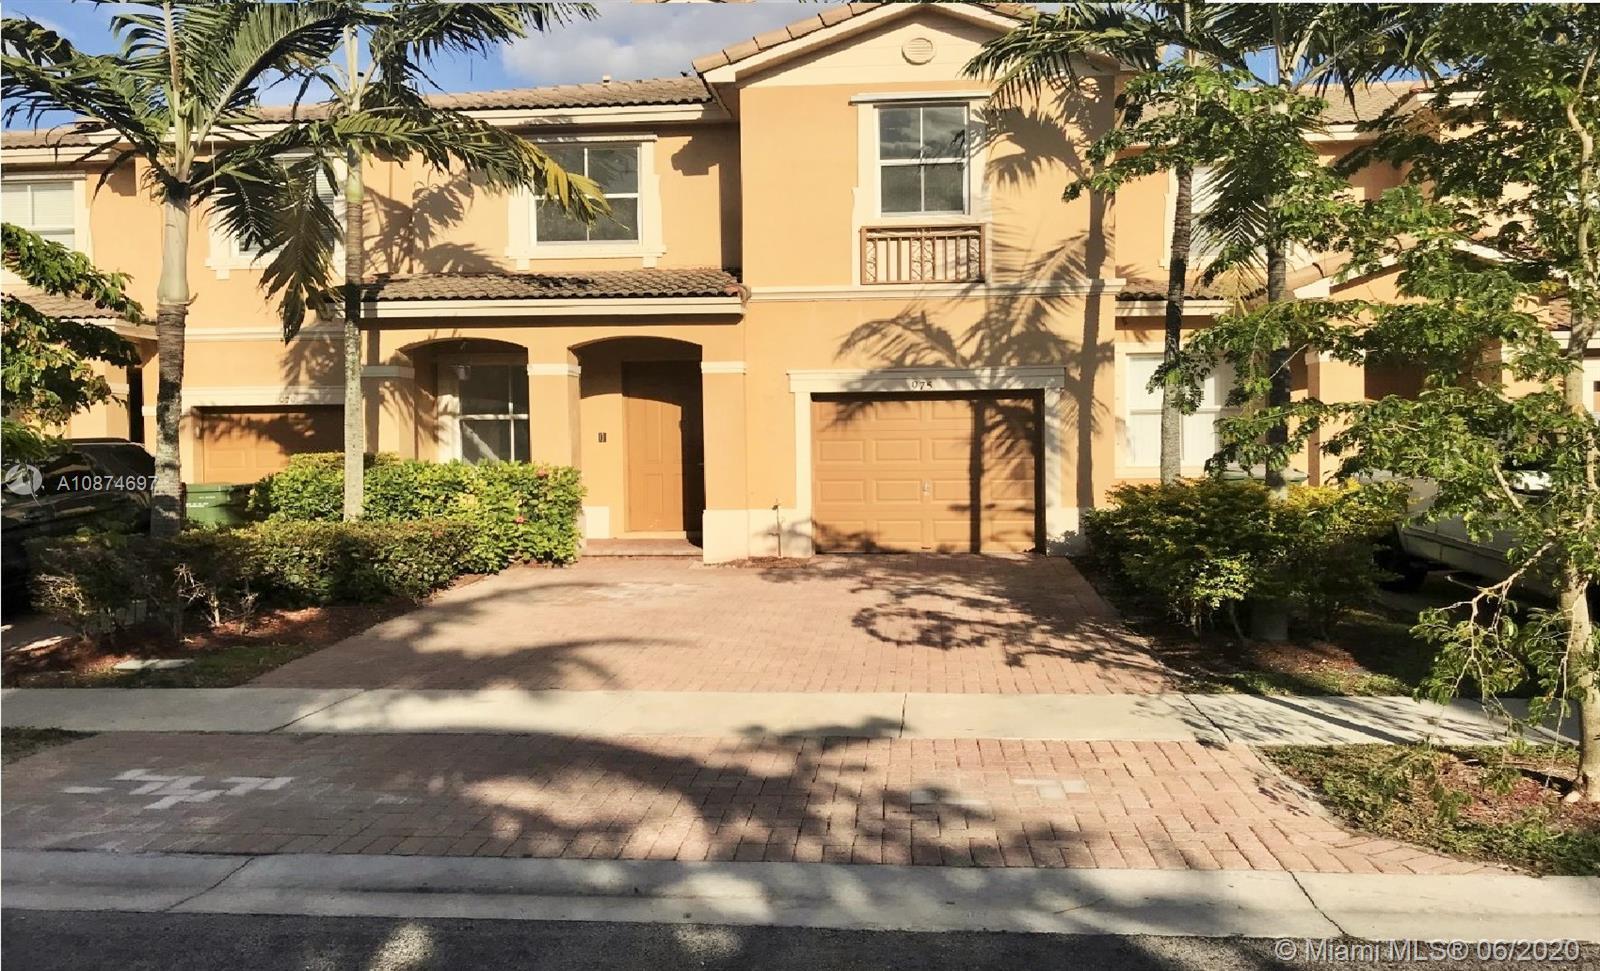 975 NE 42nd Ave Property Photo - Homestead, FL real estate listing